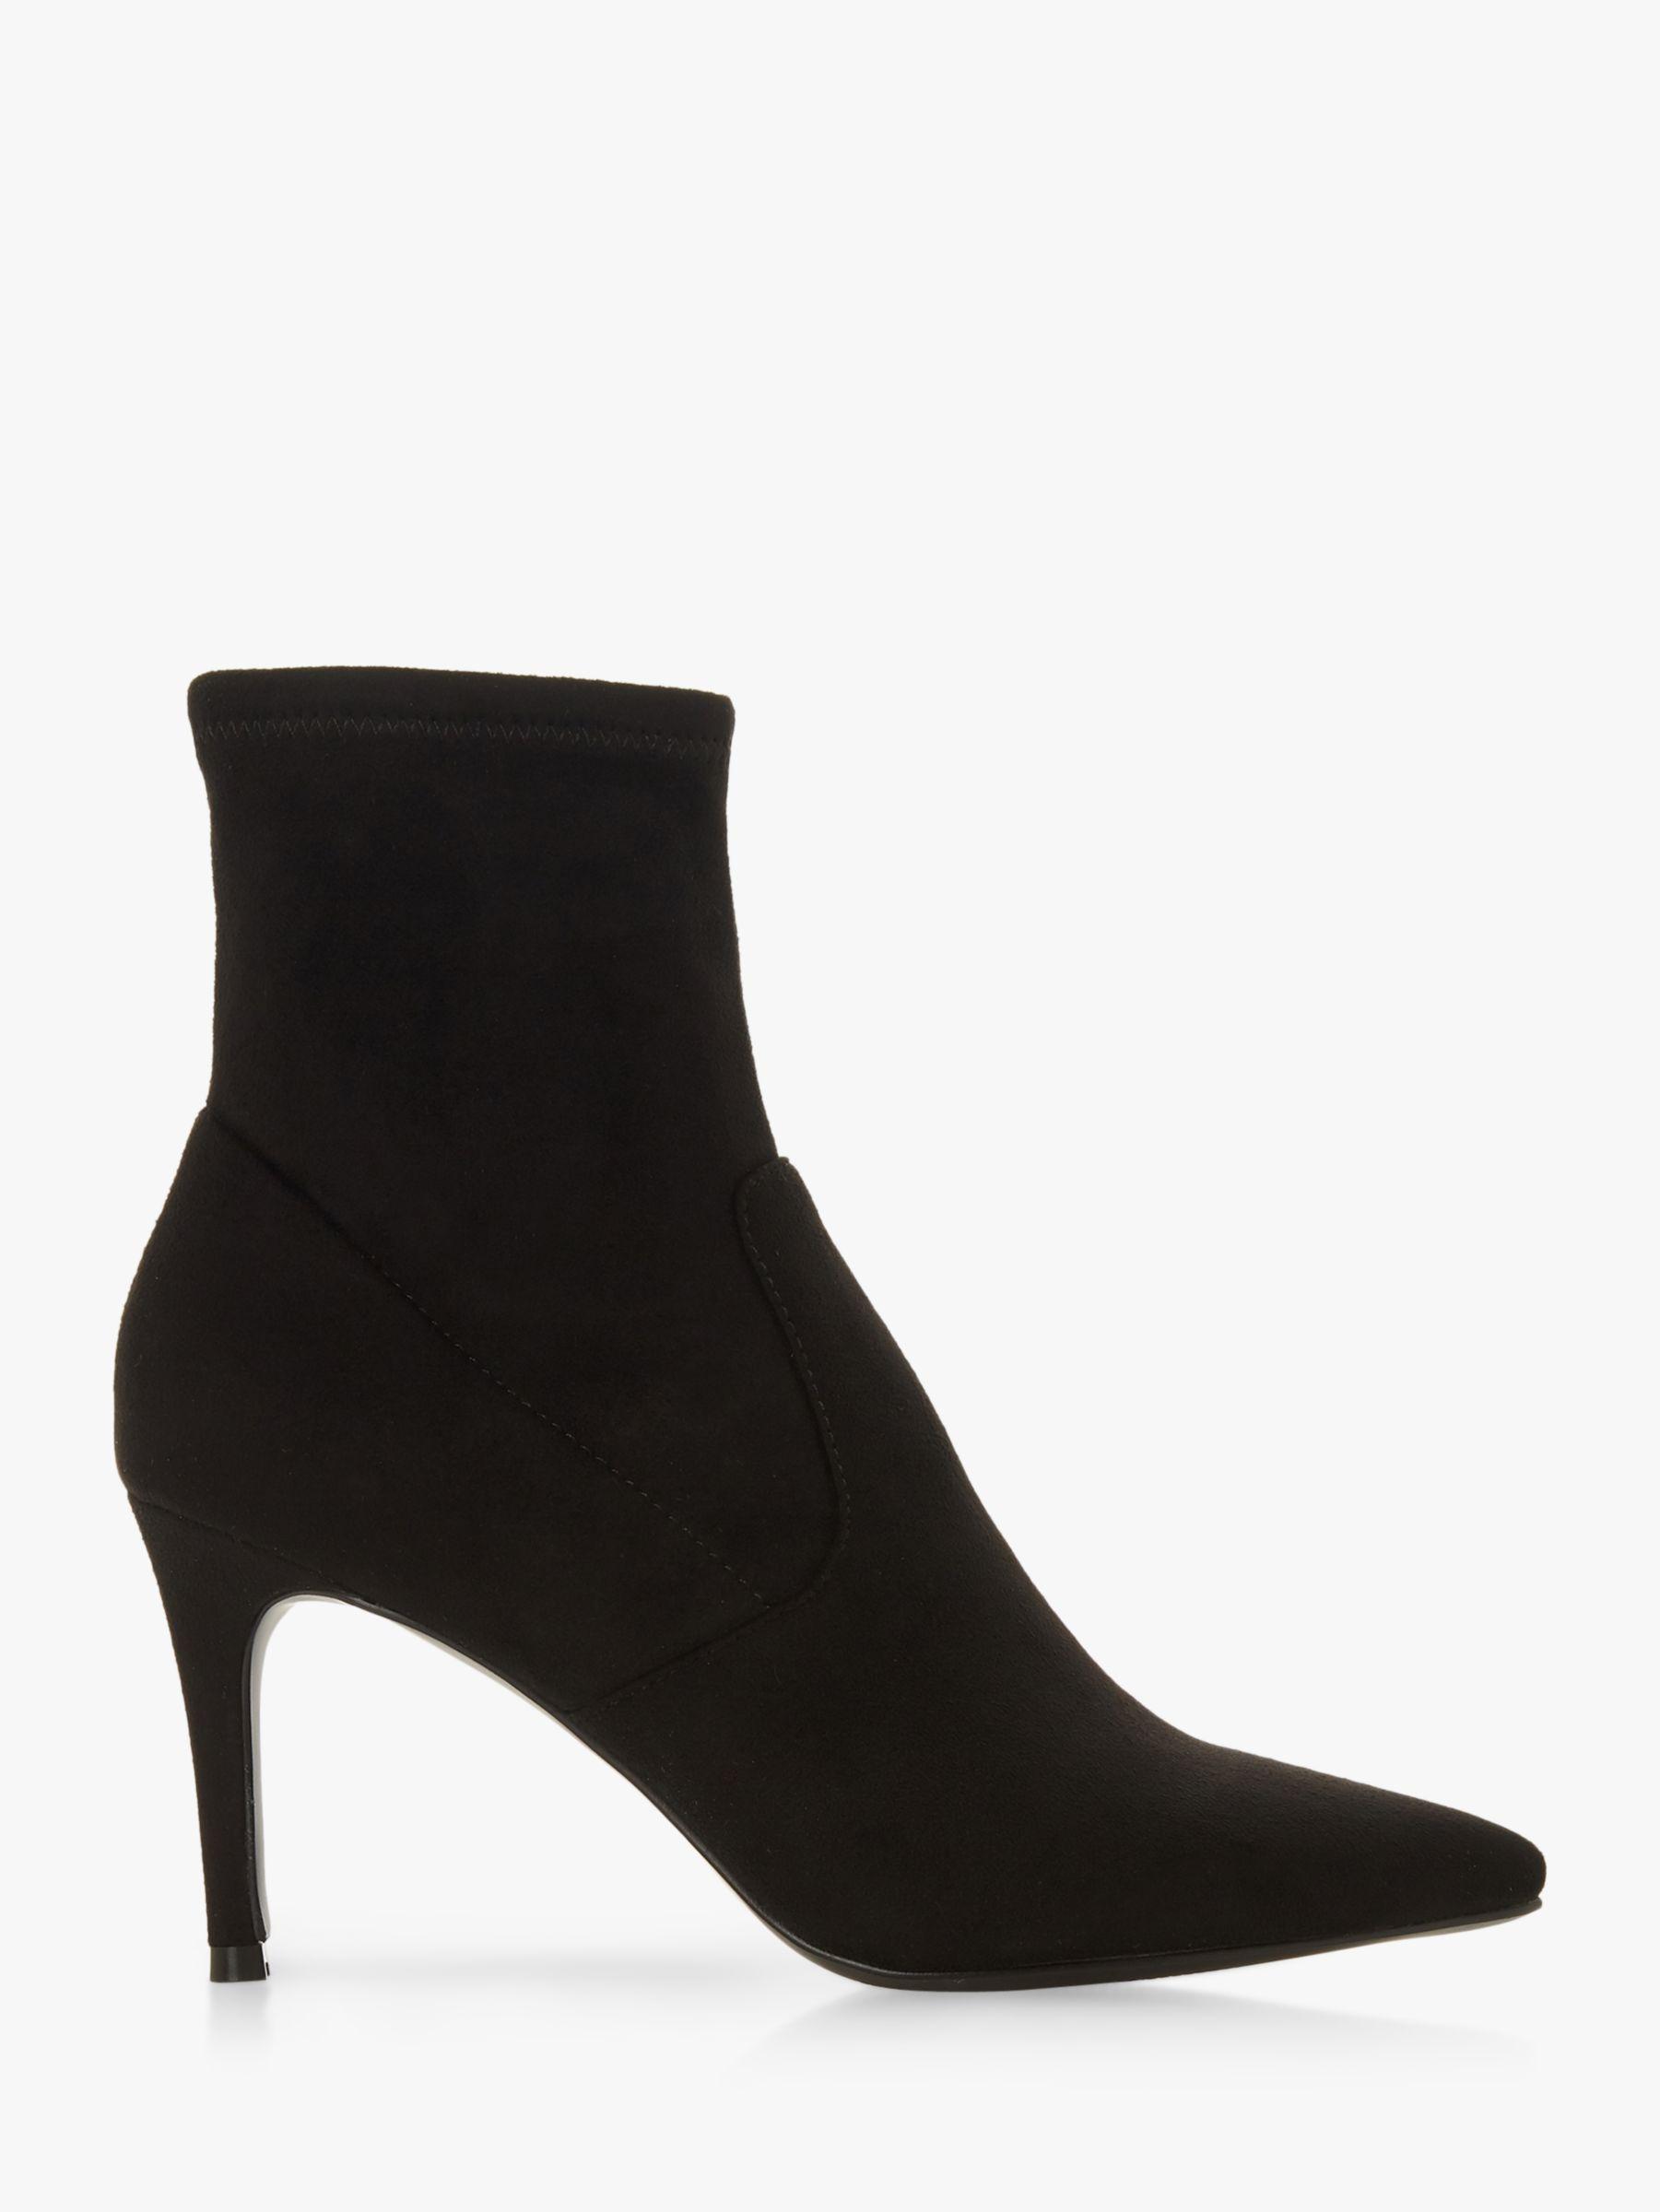 476fabf7846 Steve Madden Lava Stiletto Heel Boots, Black at John Lewis & Partners